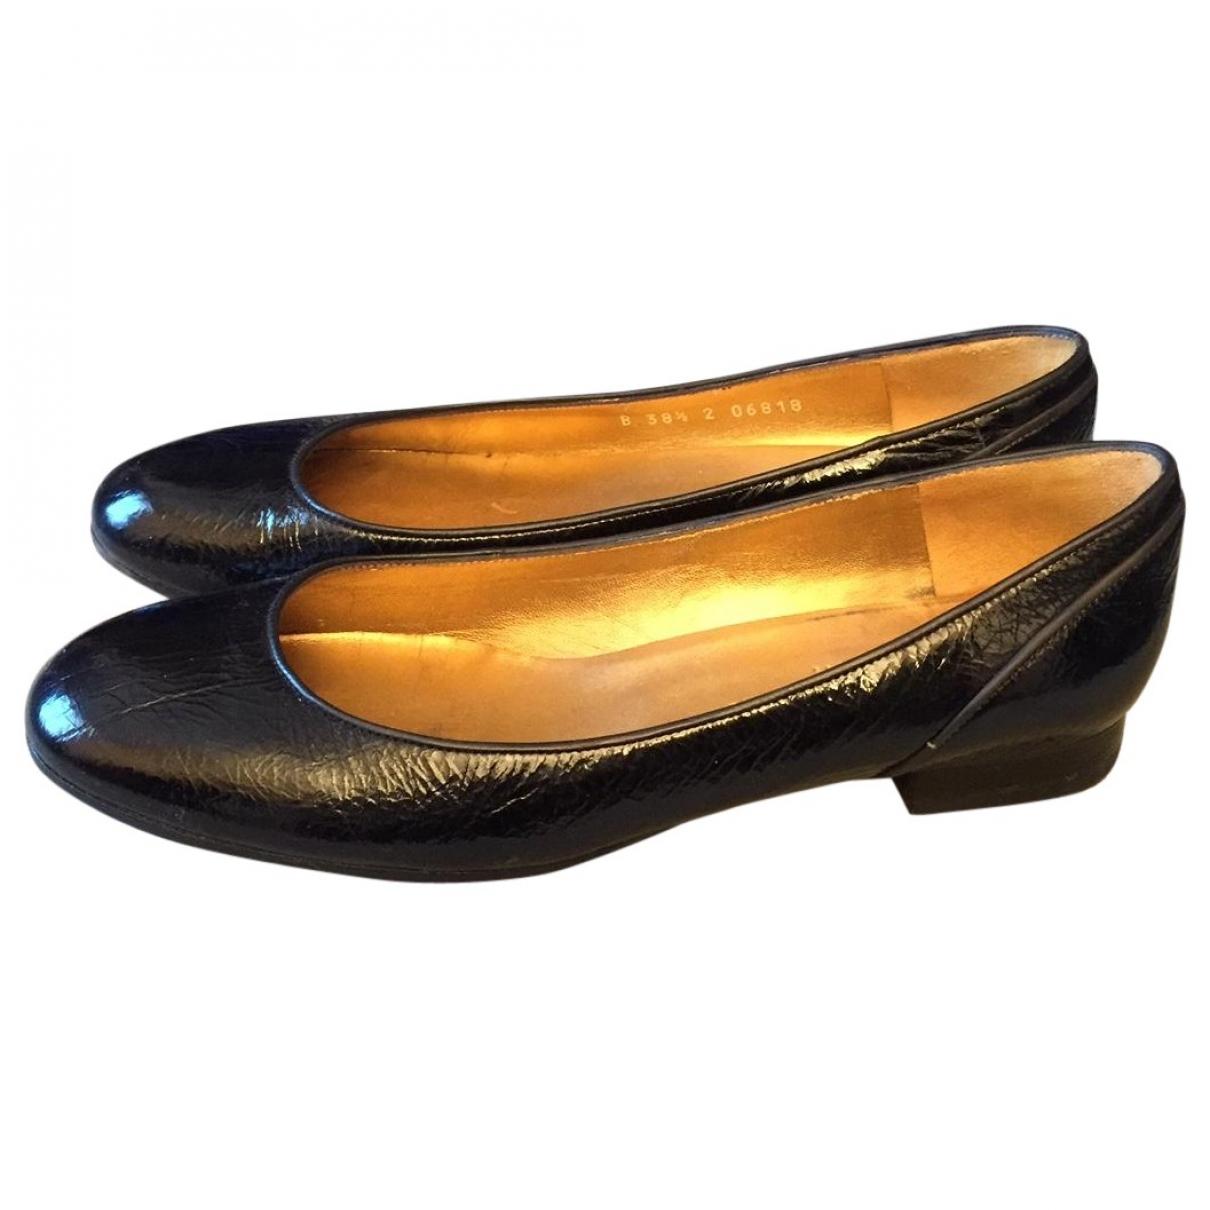 Charles Jourdan - Ballerines   pour femme en cuir verni - noir